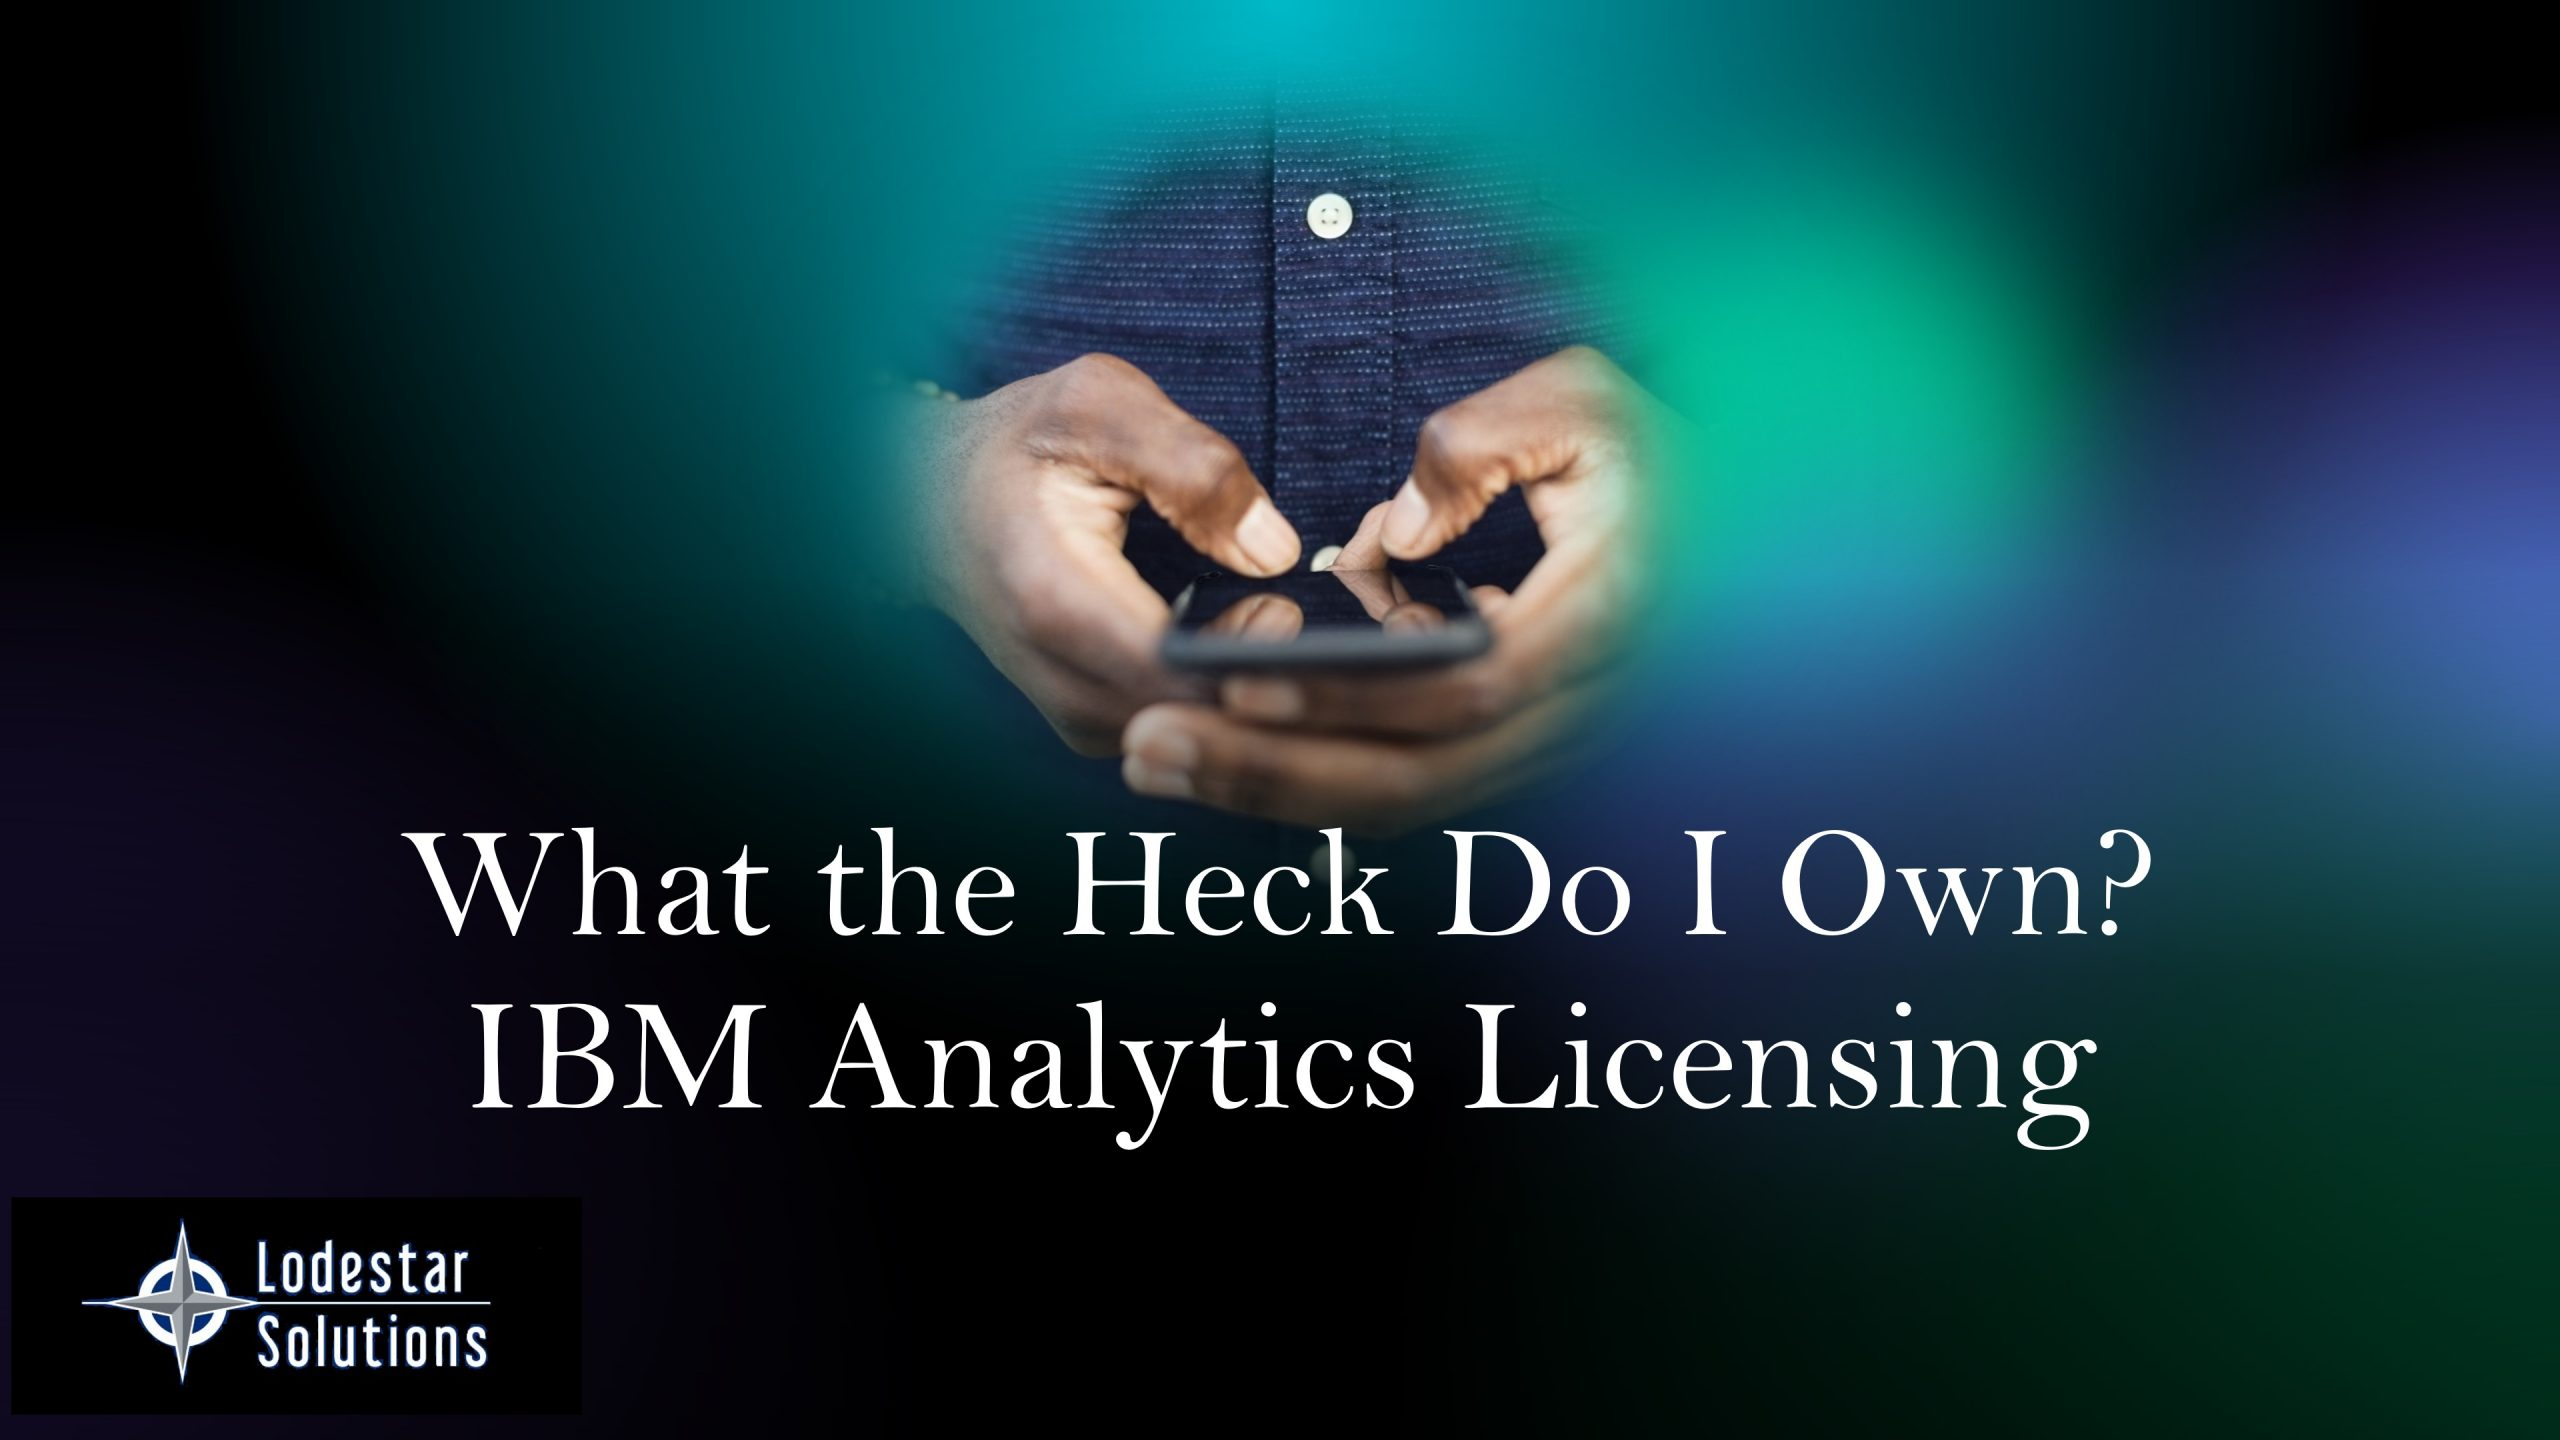 What the Heck Do I Own - IBM Analytics Licensing